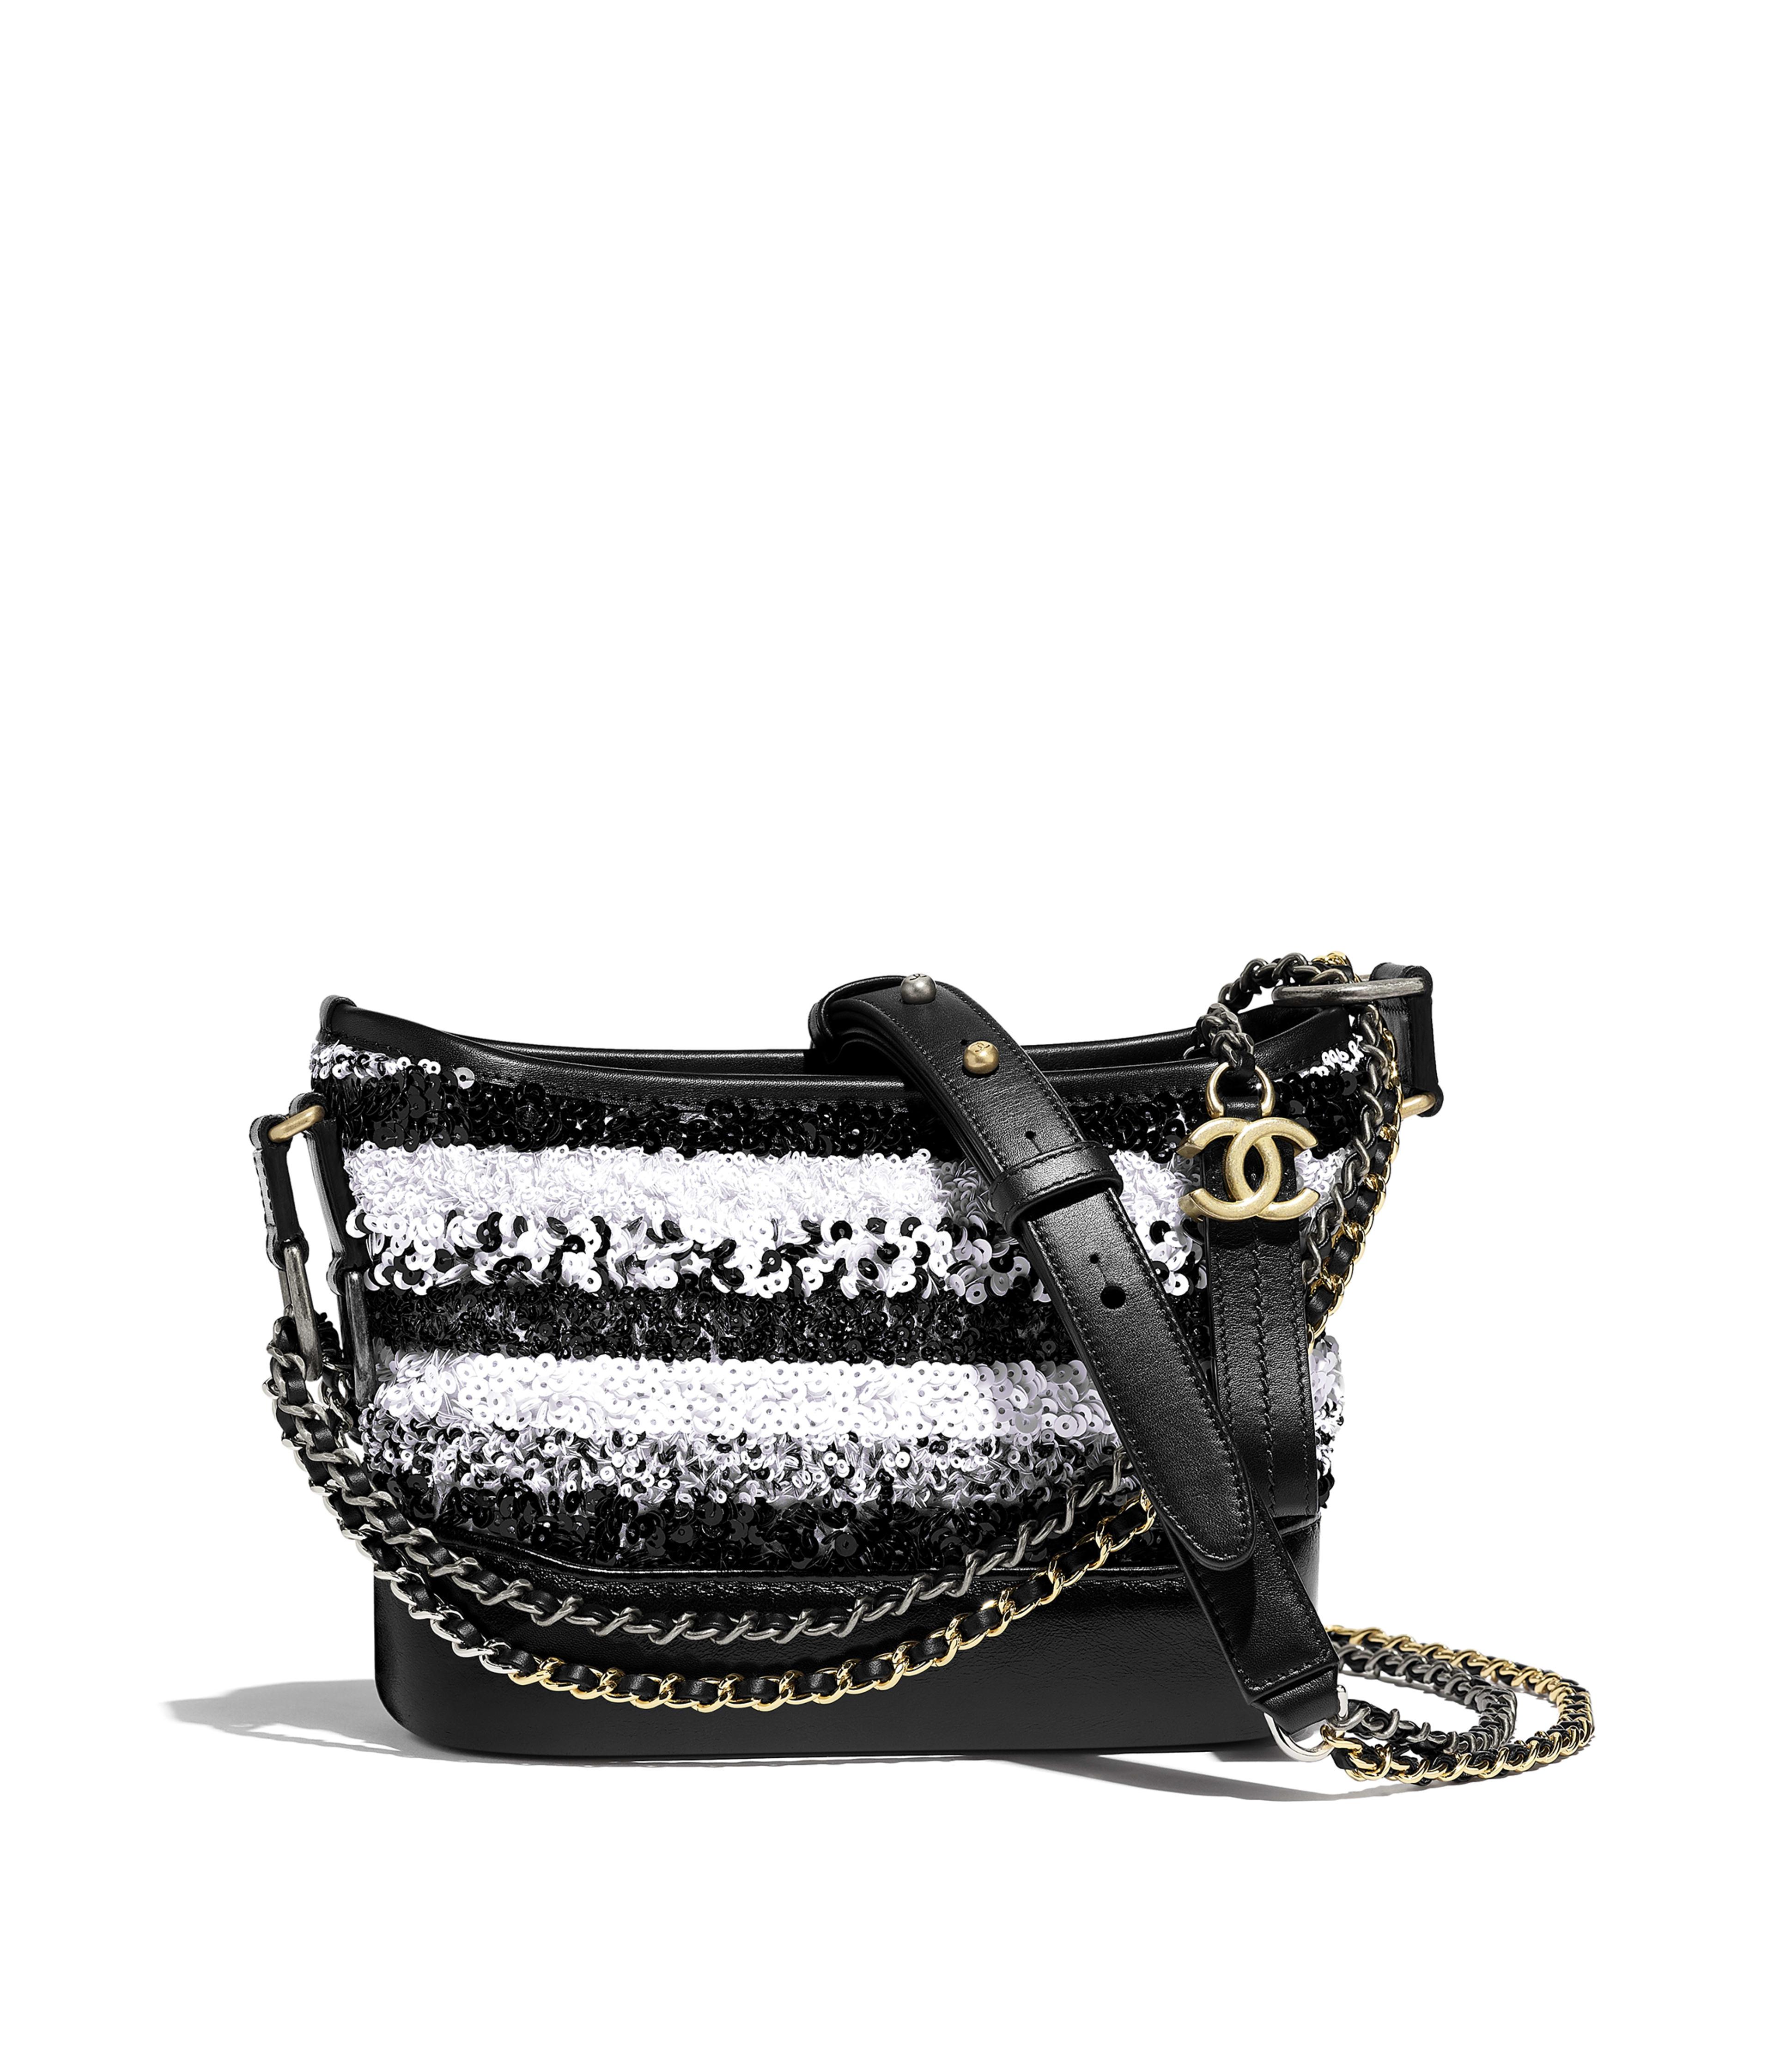 3305744255e56f CHANEL'S GABRIELLE Small Hobo Bag Sequins, Calfksin, Silver-Tone &  Gold-Tone Metal, White & Black Ref. A91810Y84186C7600